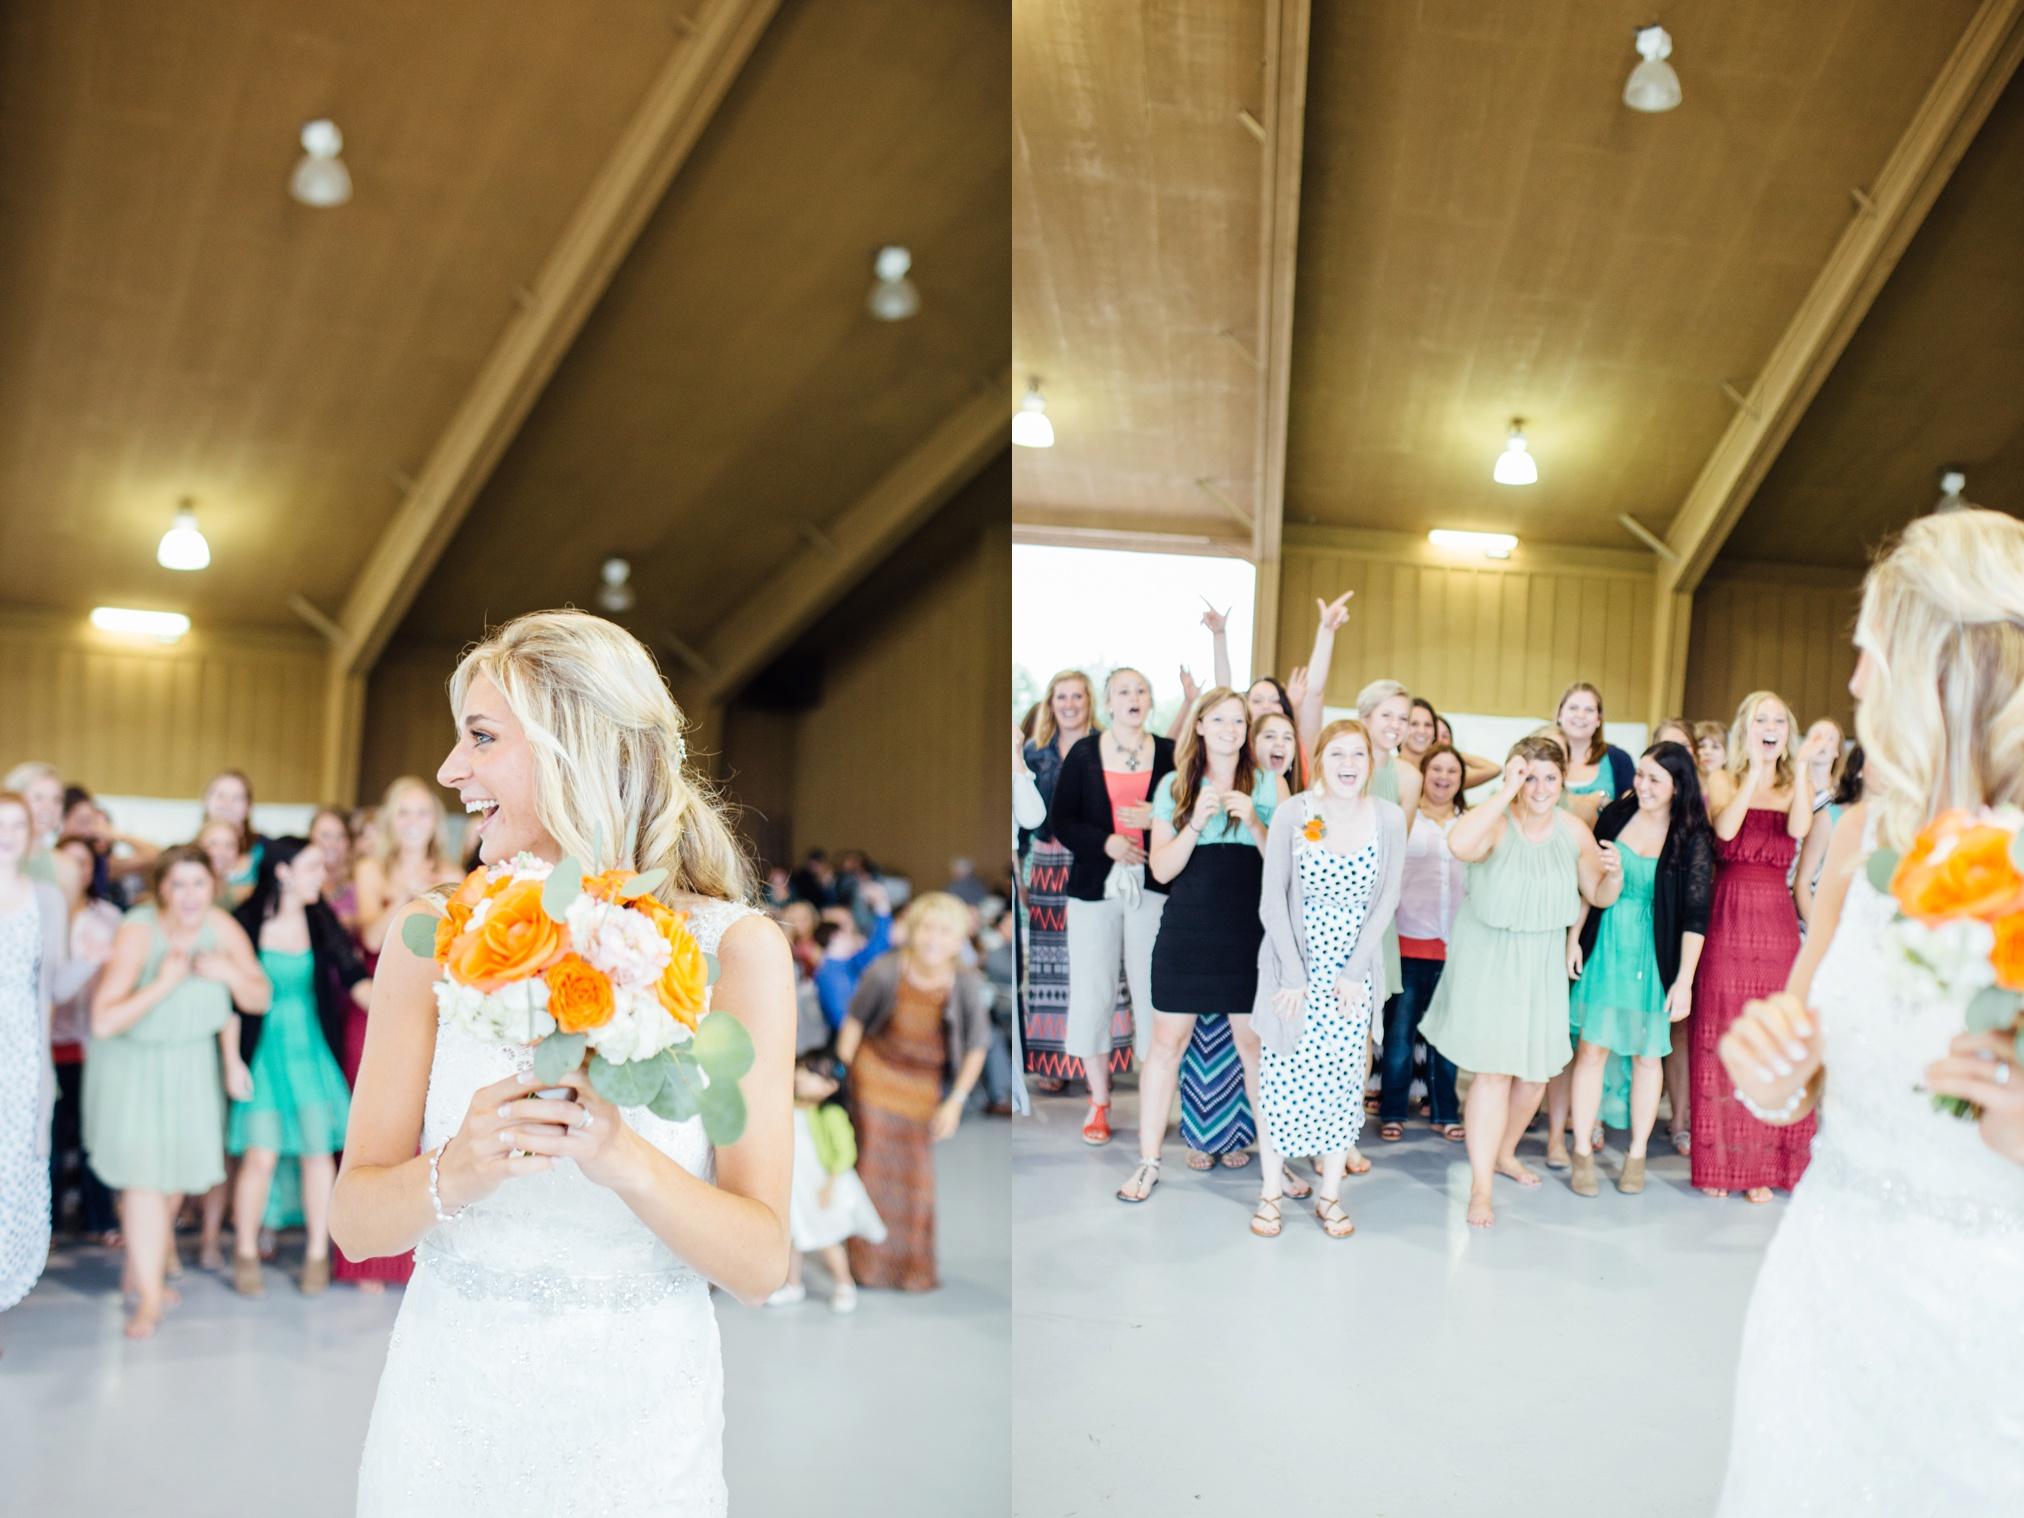 schmid_wedding-843.jpg